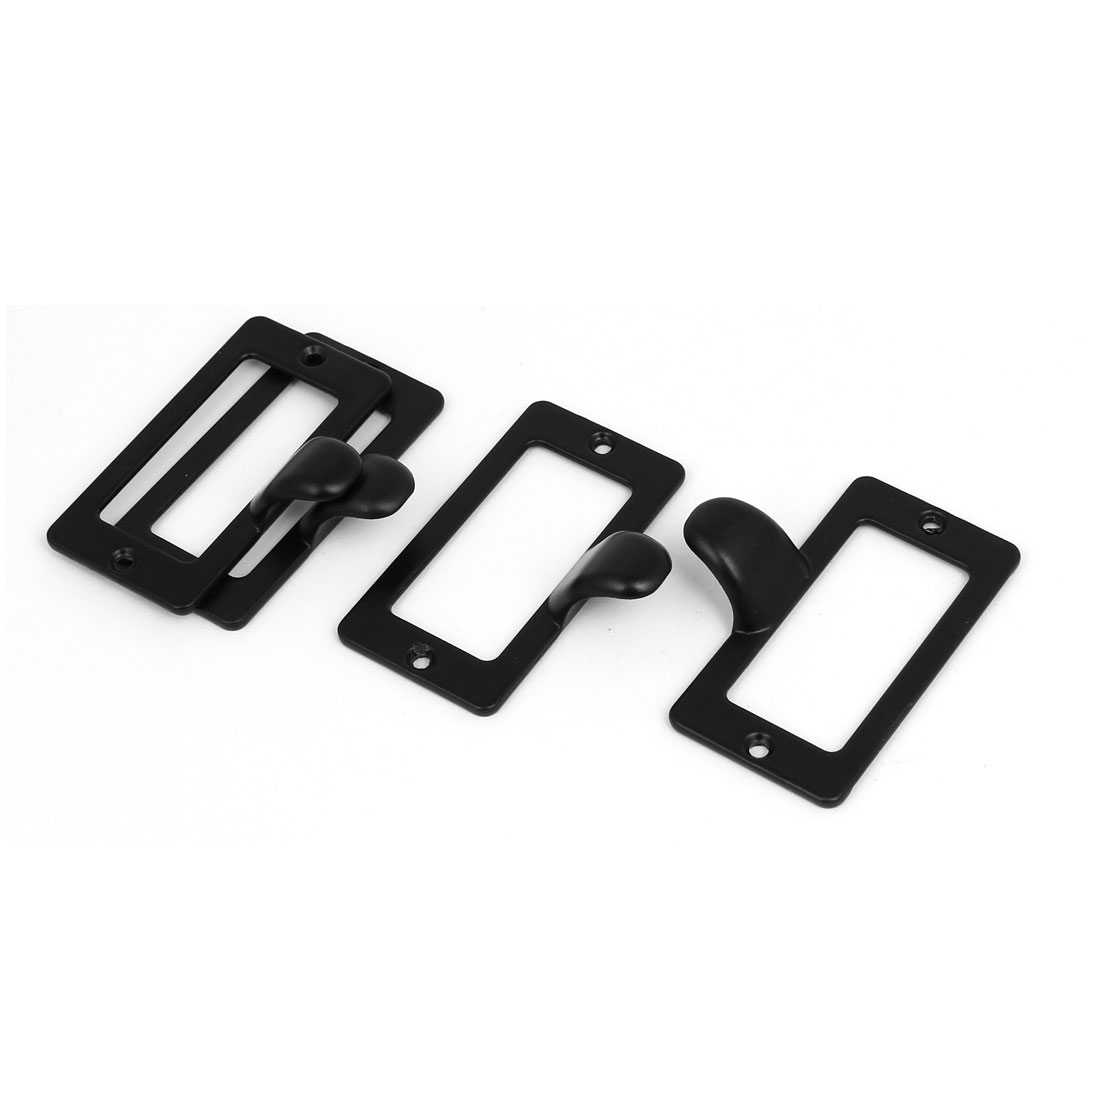 Office Cabinet Drawer Tag Frame Label Holder Pull Handles Black 59mm x 31mm 4PCS - image 4 of 4